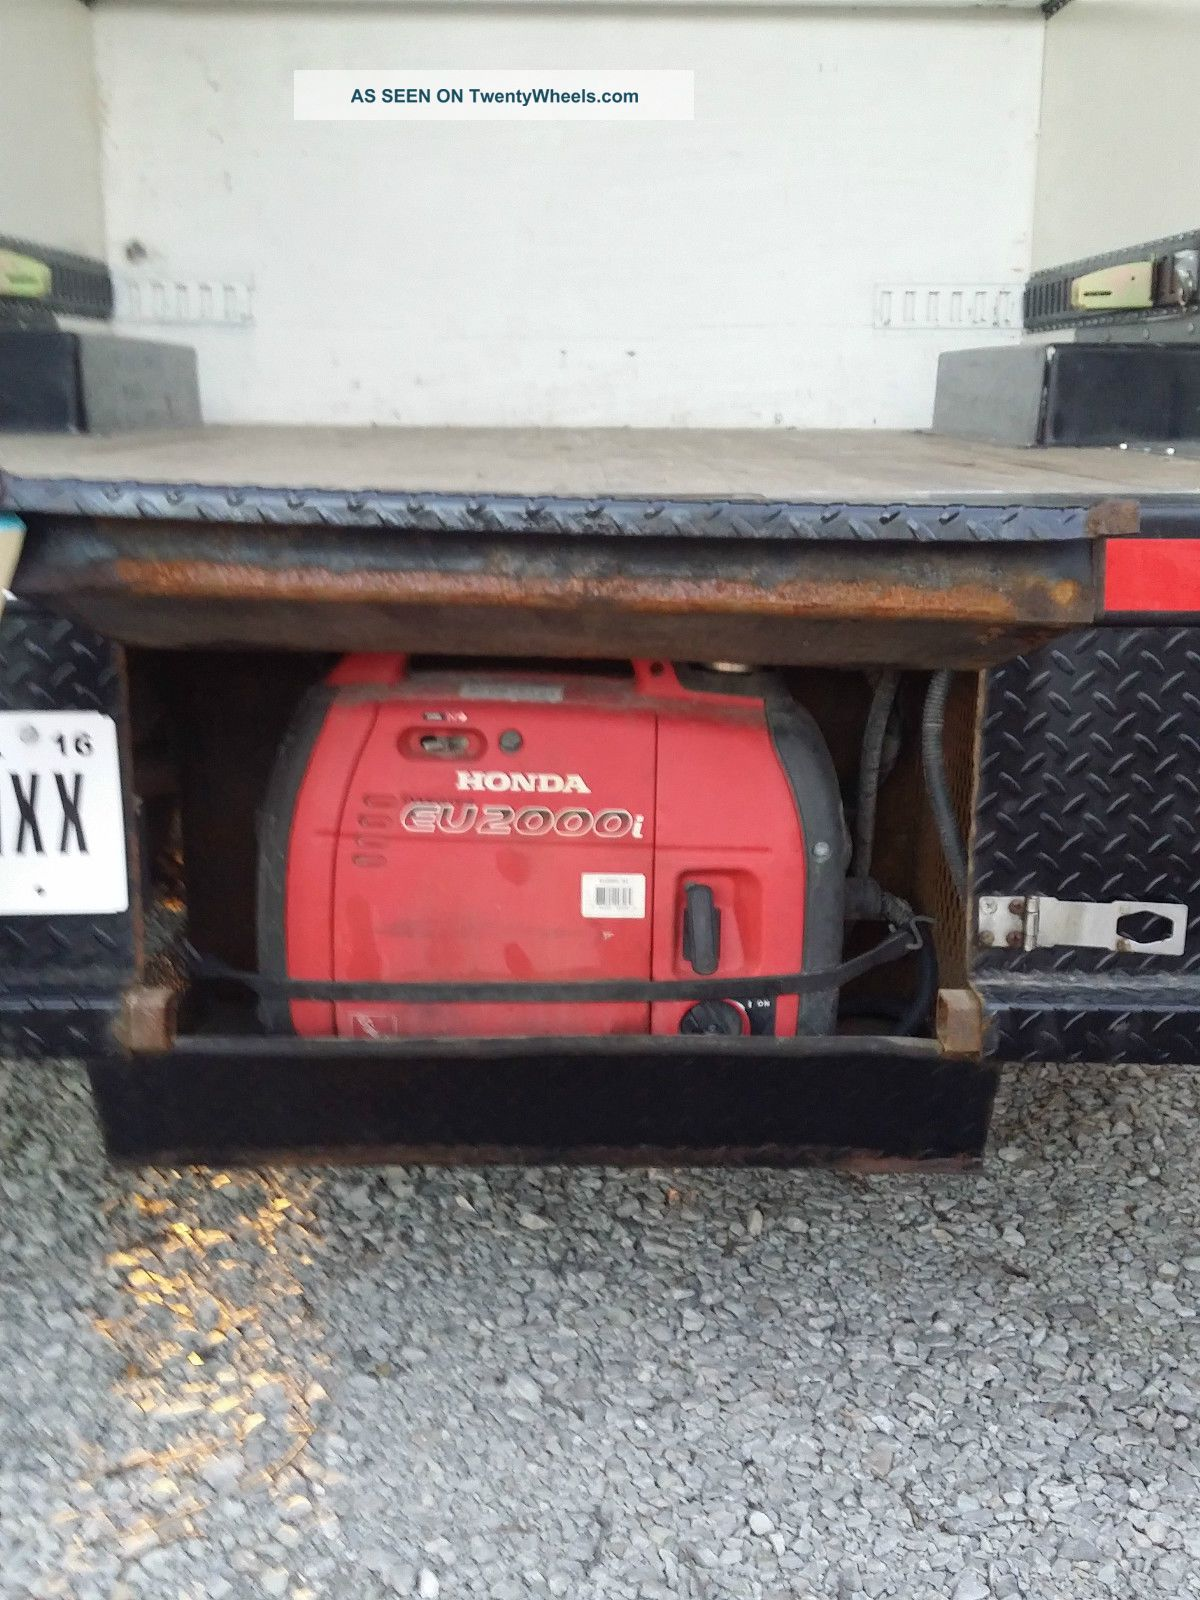 2013_gmc_savana_3500_box_truck_7_lgw Where Is The Fuse Box On A Kenworth Truck on